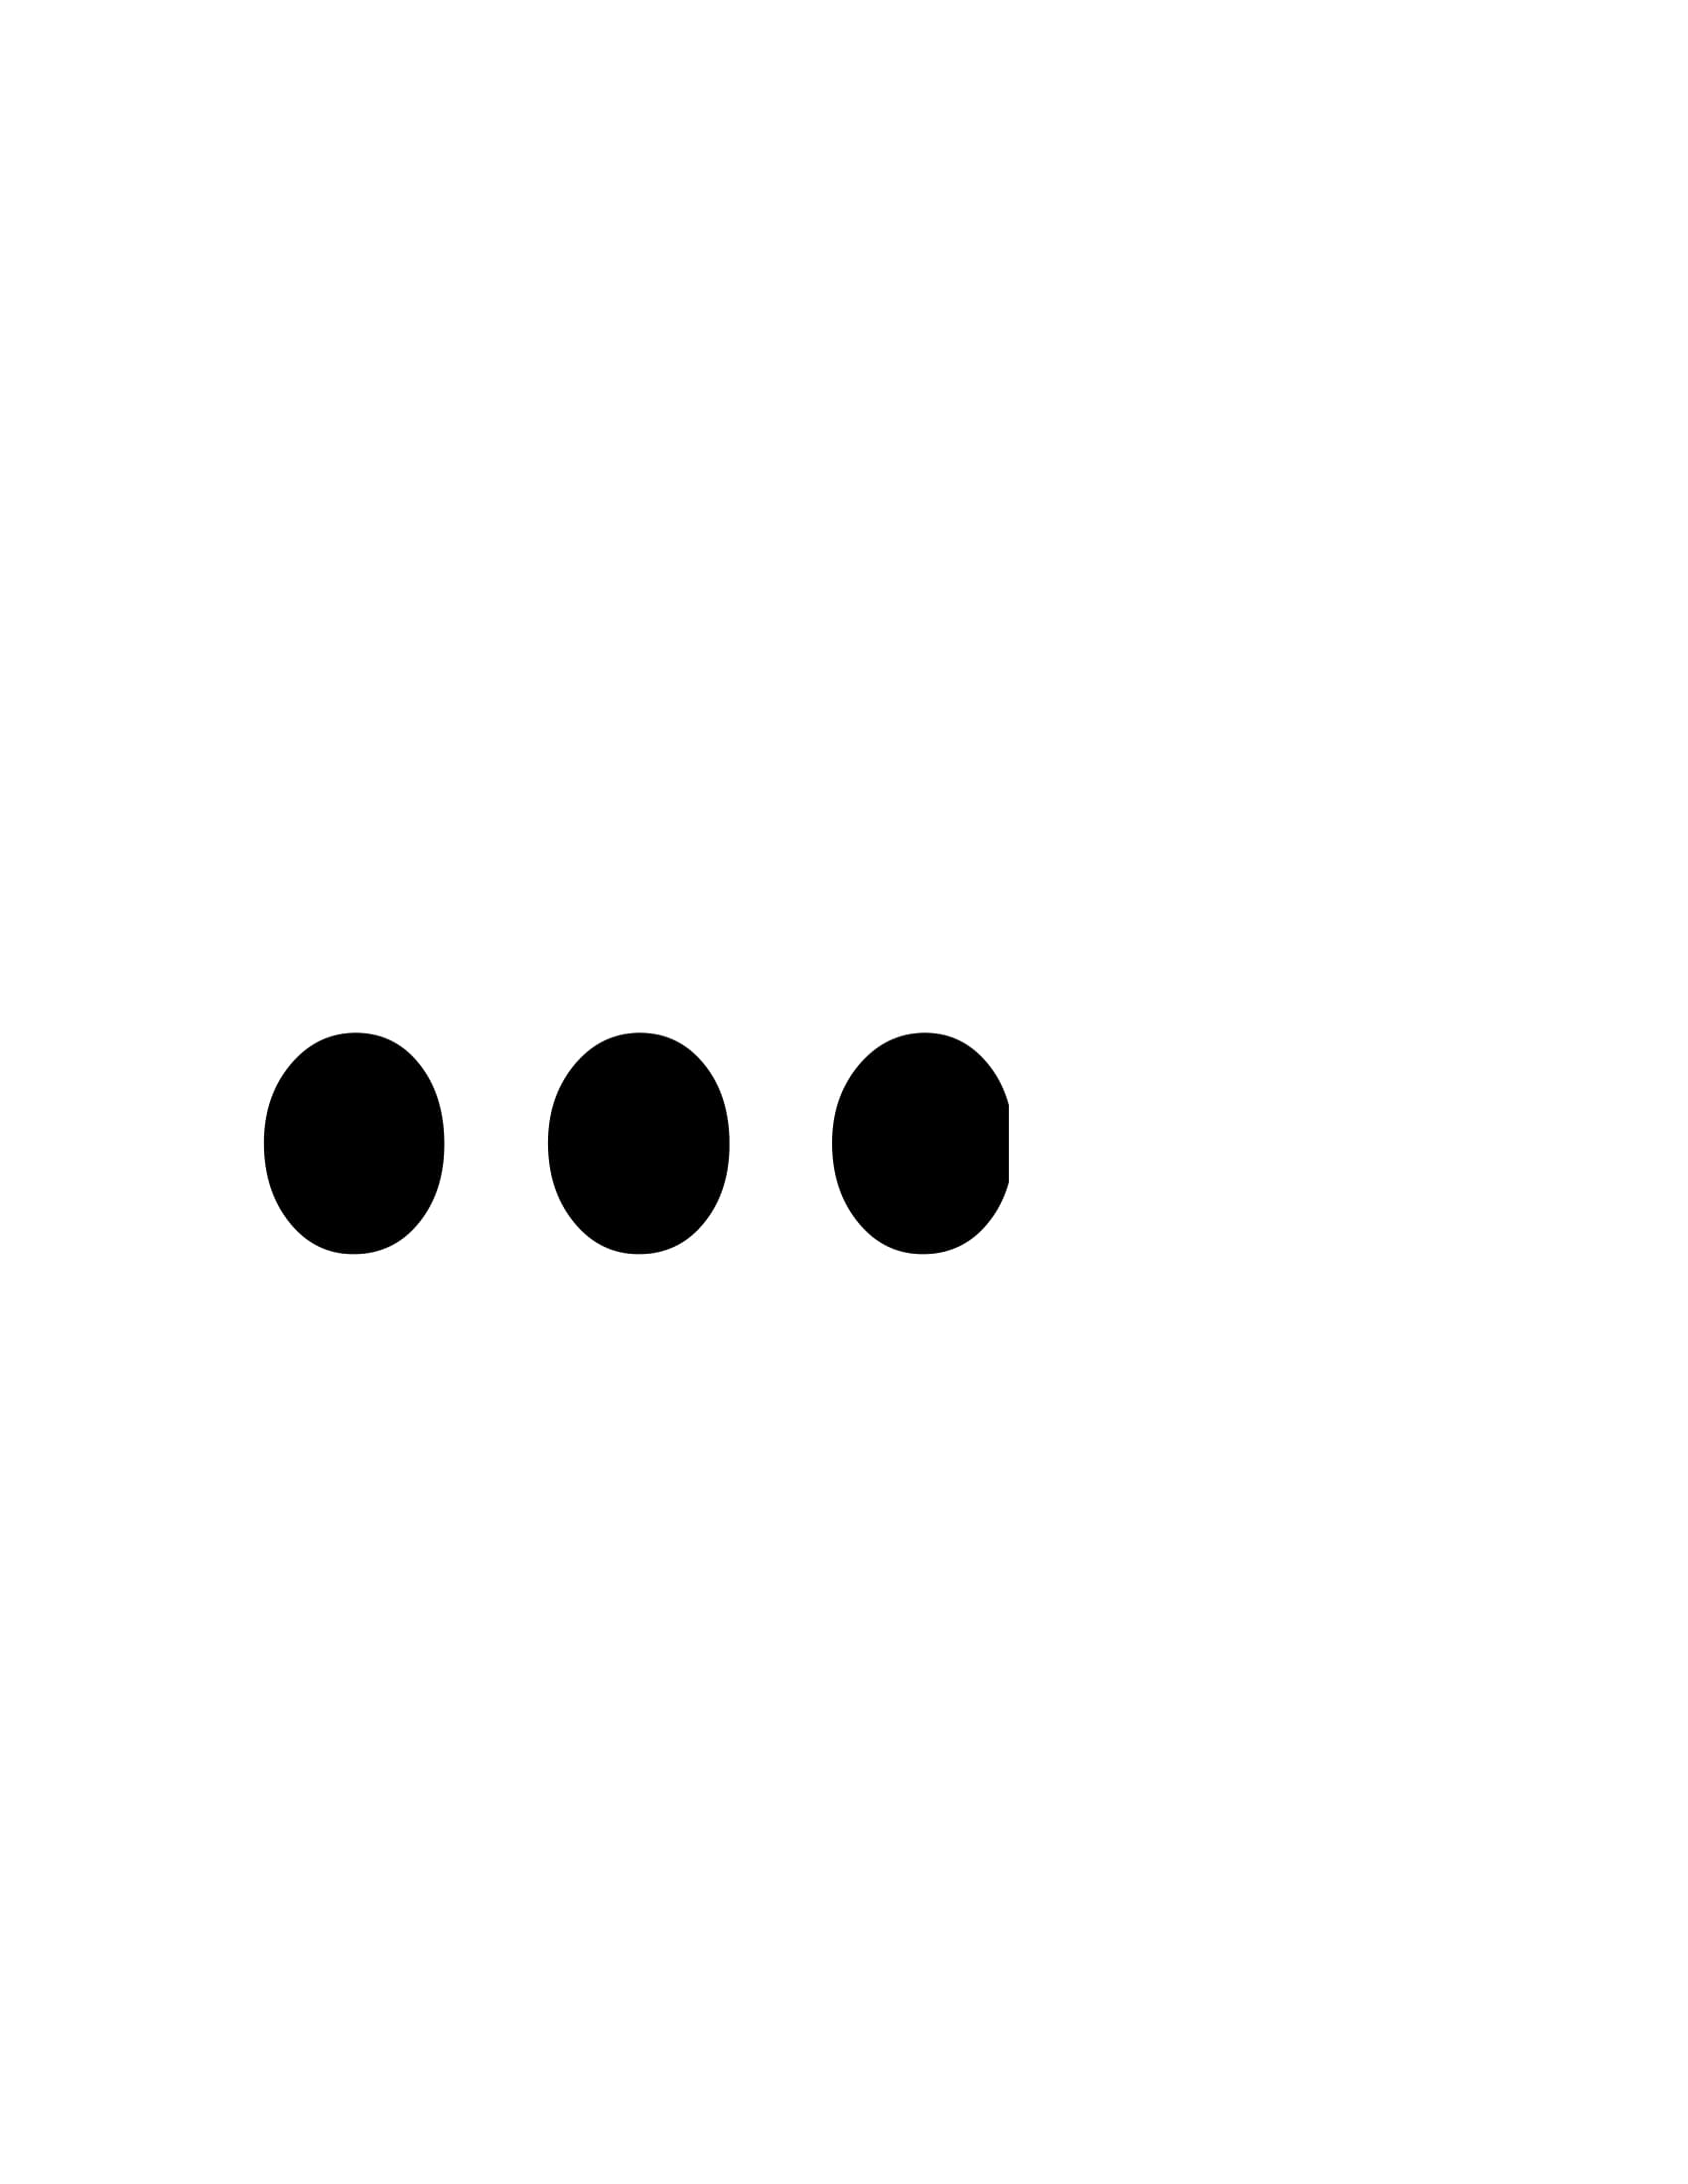 dots 1-1